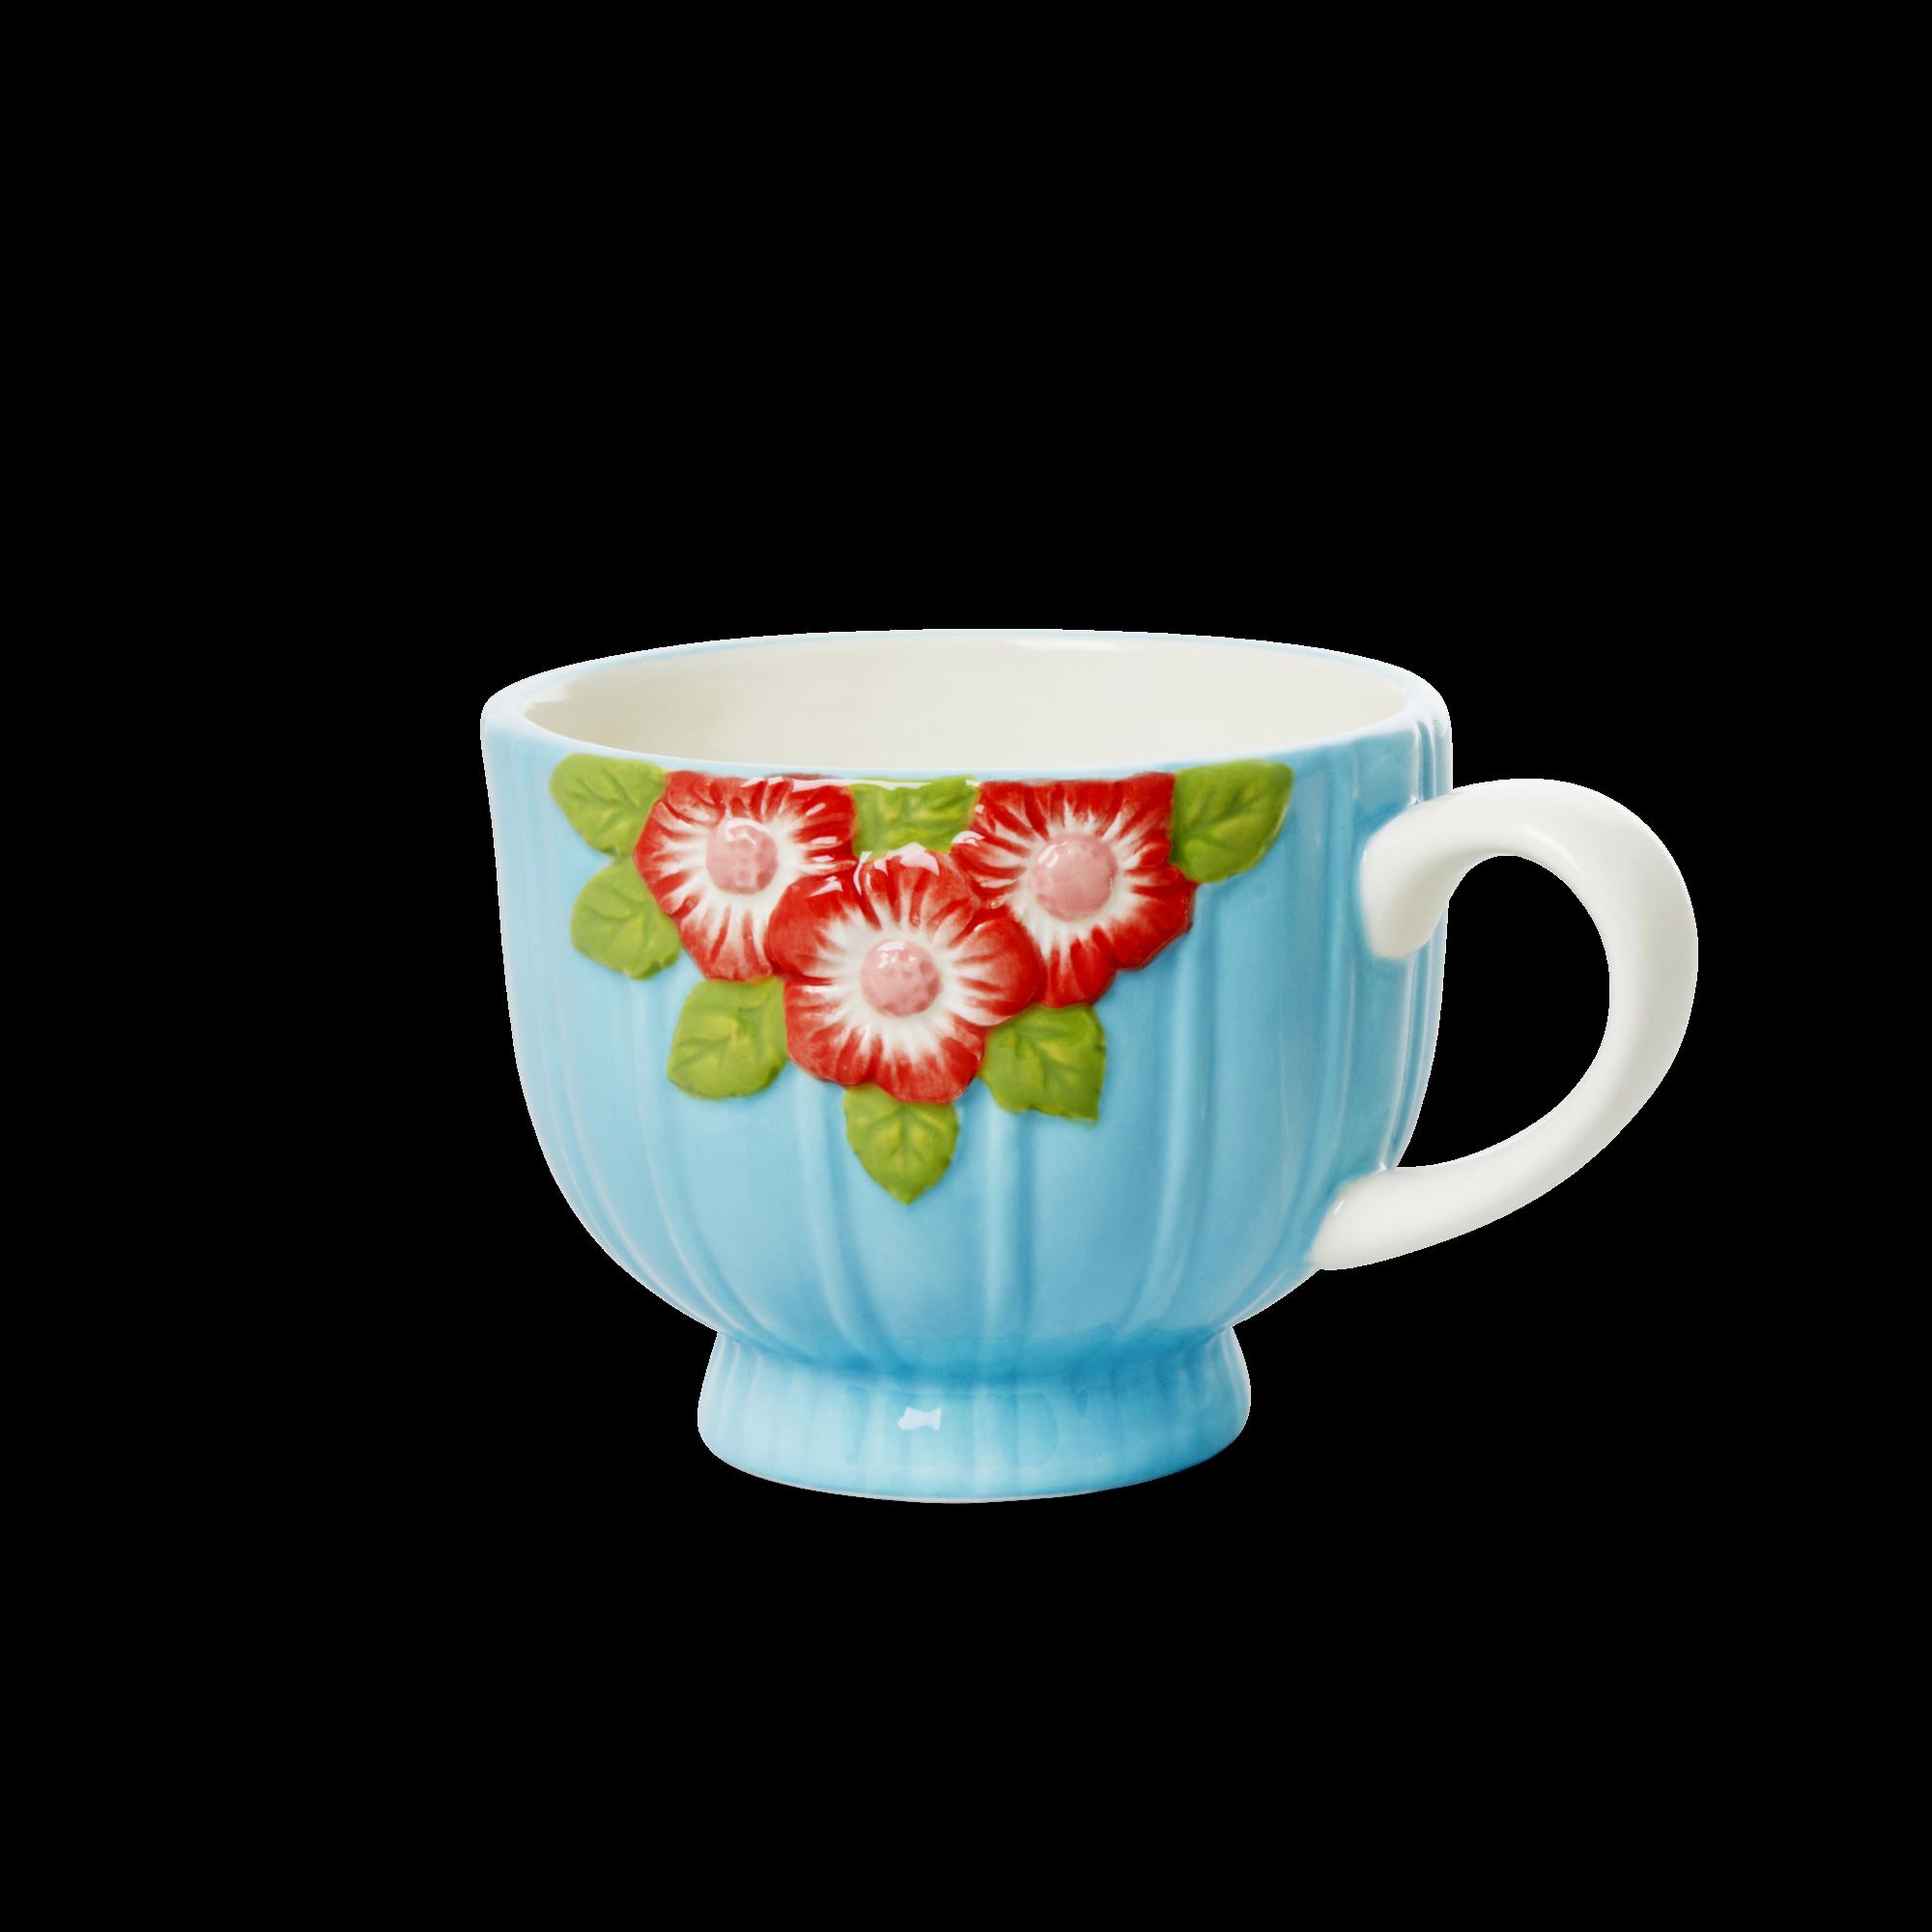 Rice - Ceramic Mug -  Embossed Purple Flower Design